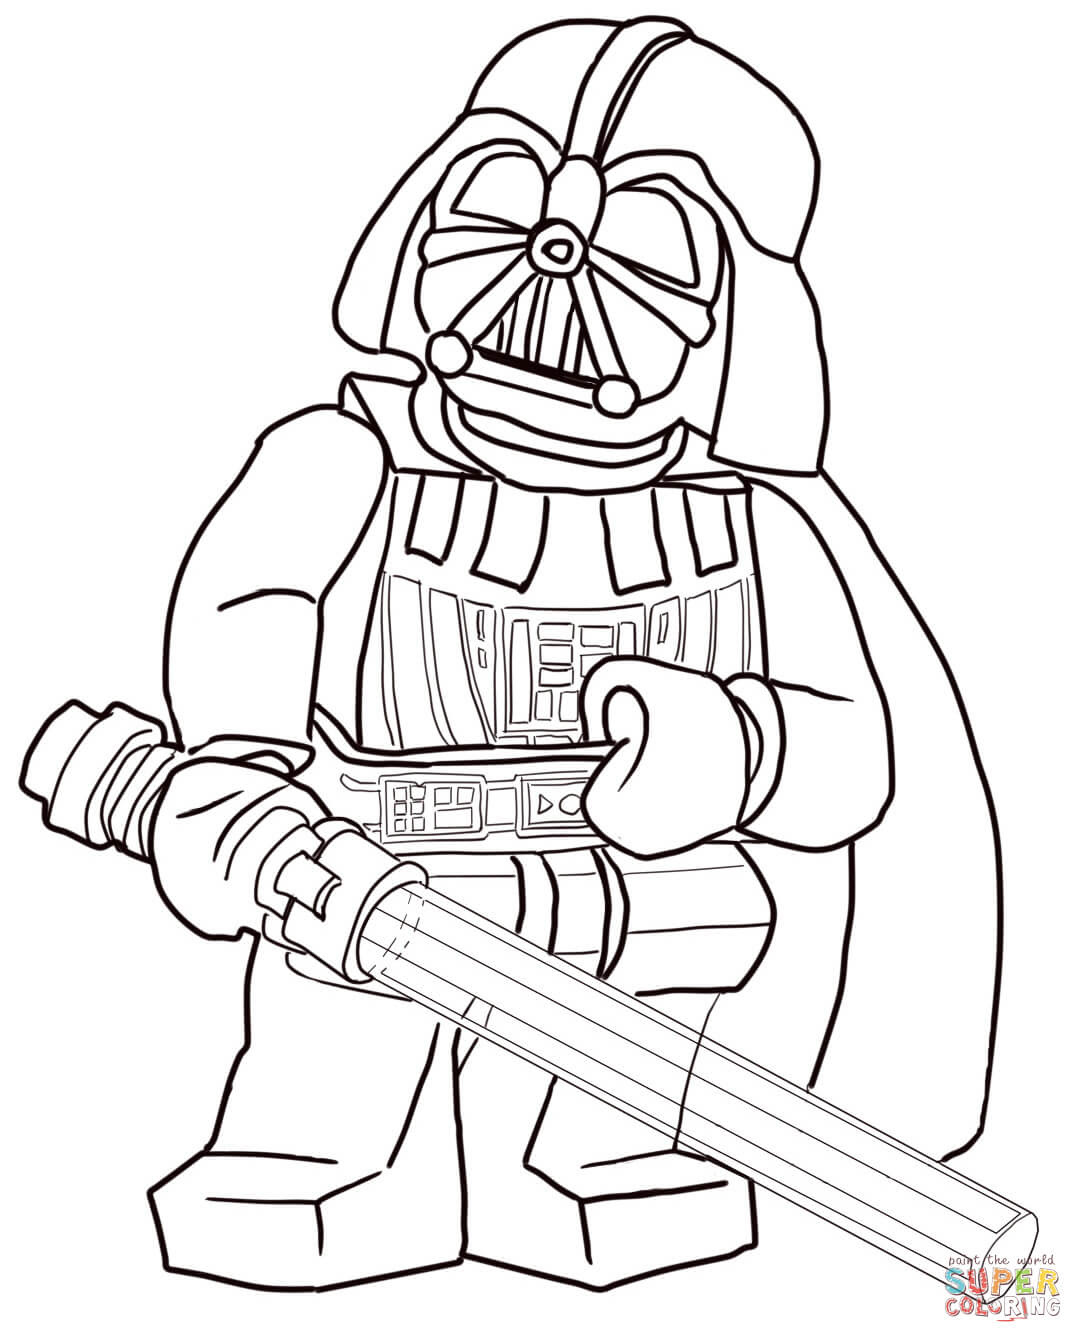 Klick das Bild Lego Star Wars Darth Vader